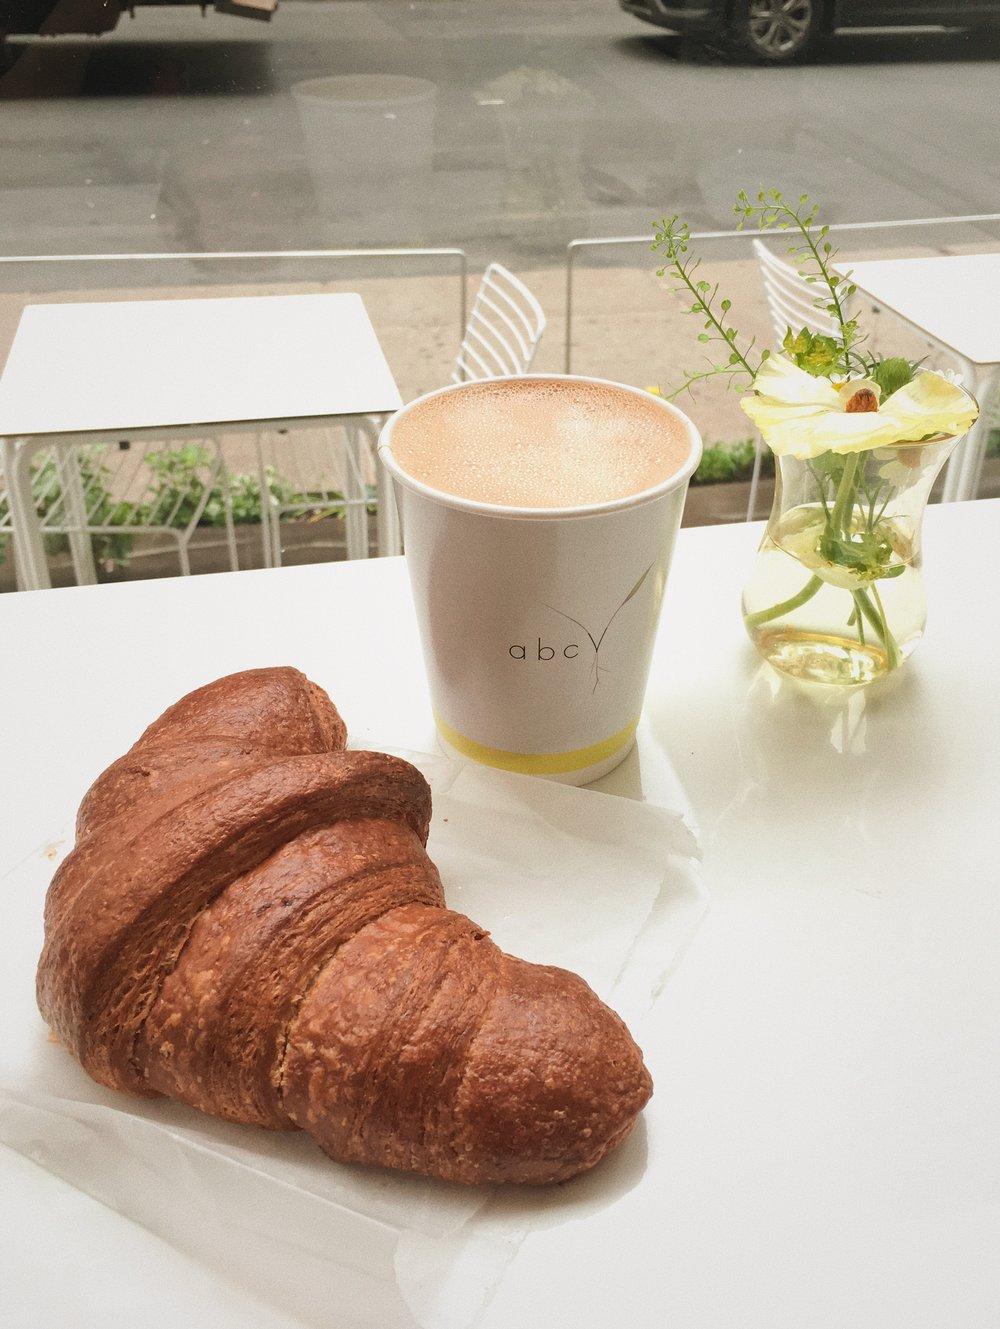 Plain Vegan Croissant with Almond Cappuccino